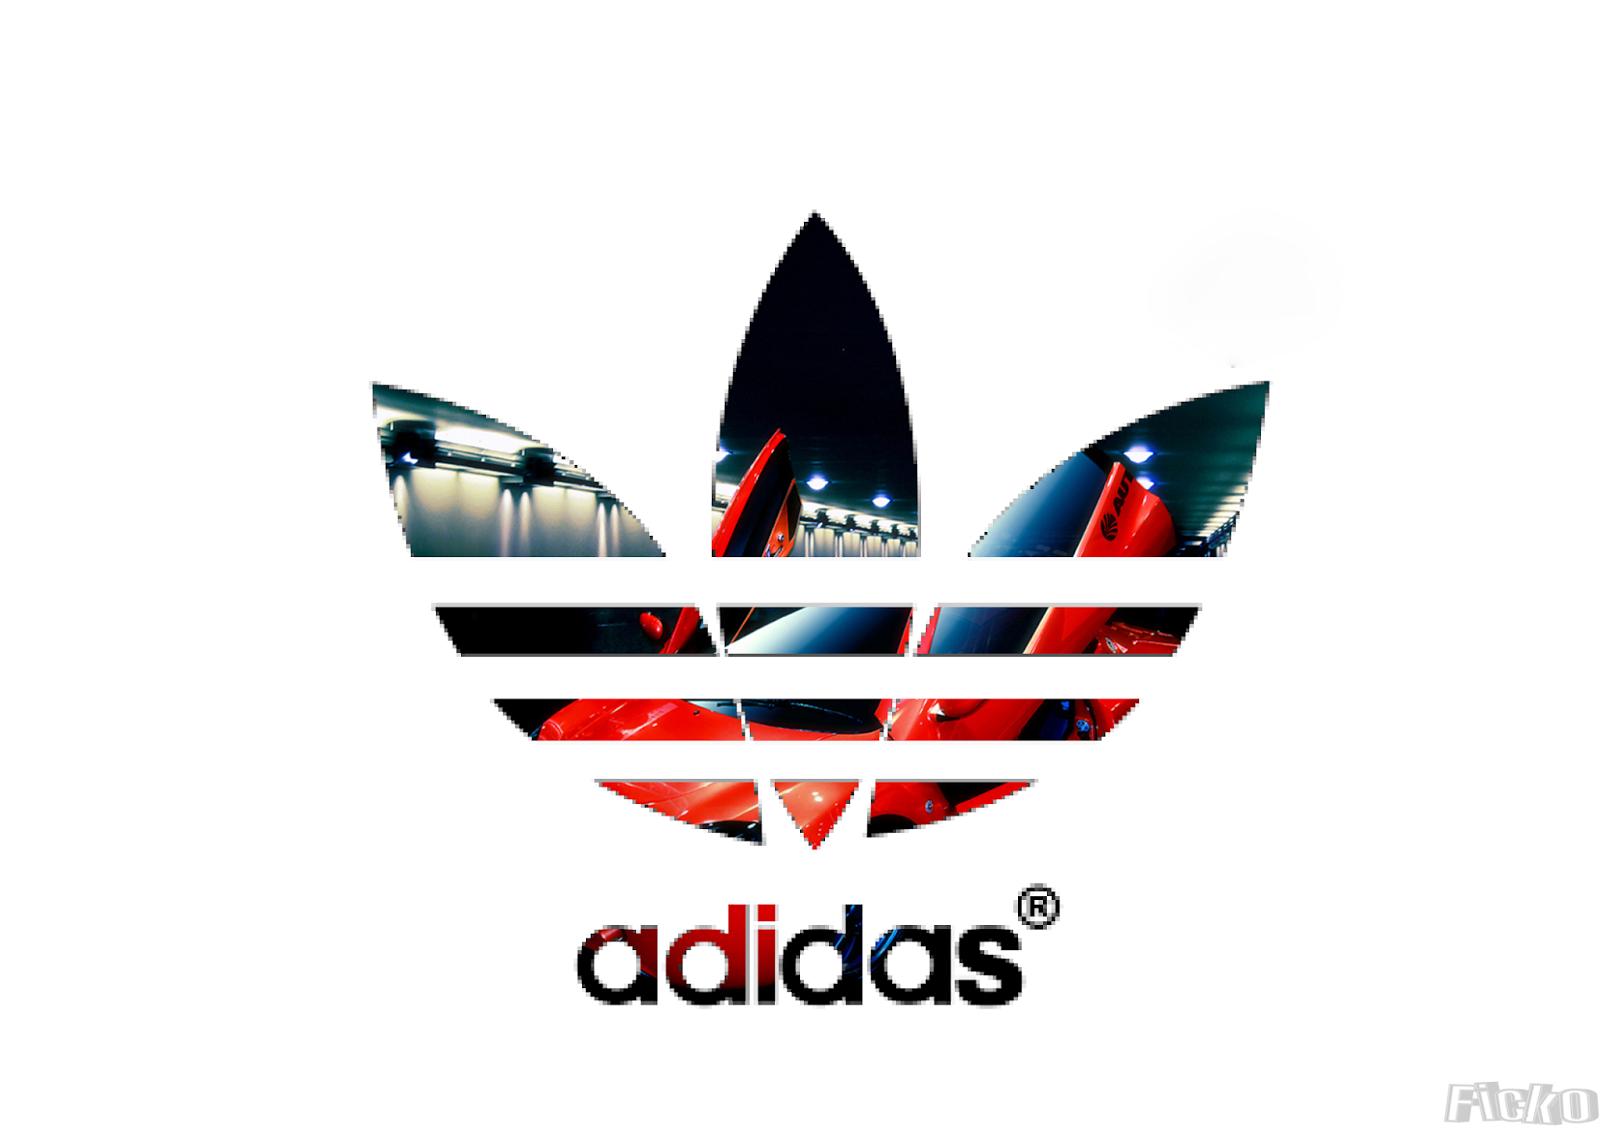 Mejores 100 Fondos De Nike: Fondos De Pantallas Adidas